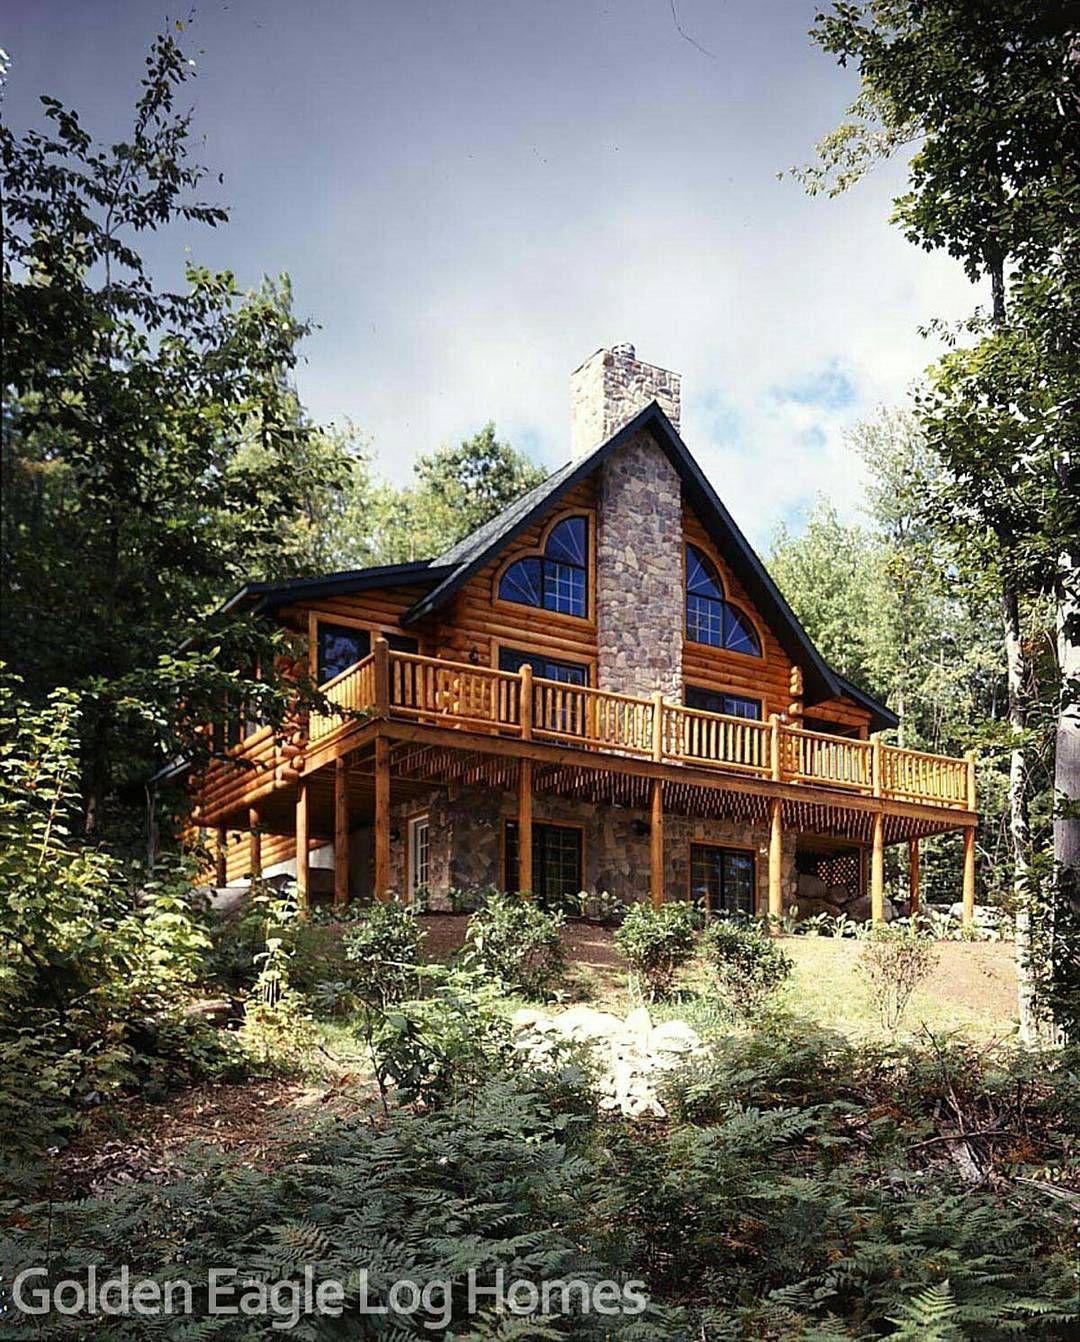 Photos And Floor Plans Of This Custom Home Are At Www Goldeneagleloghomes Com Loghomes Loghome Logcabins Cabin Log Log Homes Timber House Log Home Living